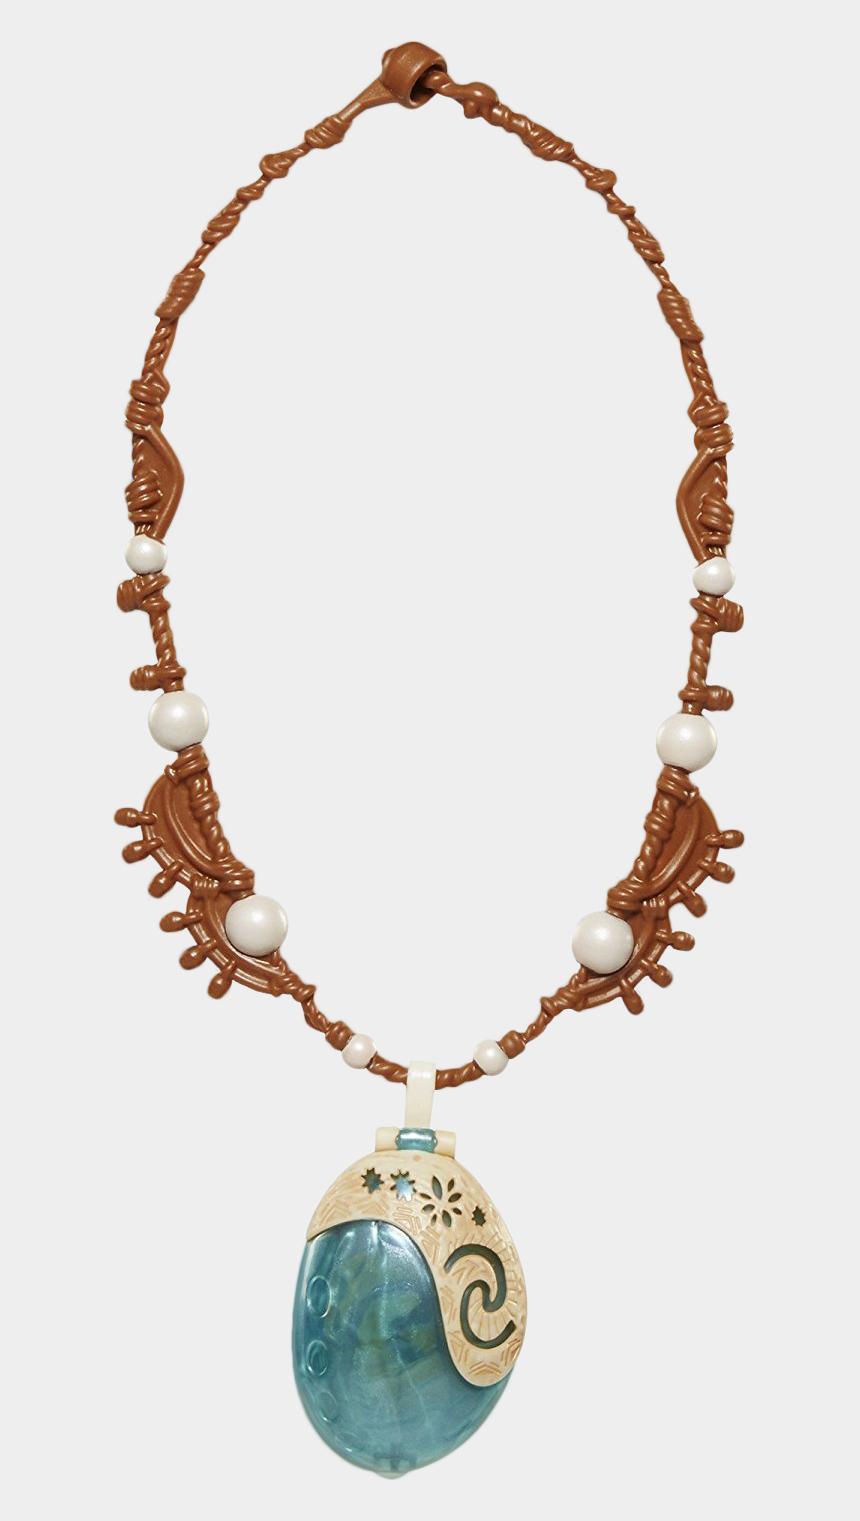 necklace clipart, Cartoons - Necklace Clipart Moana - Moana Magical Necklace